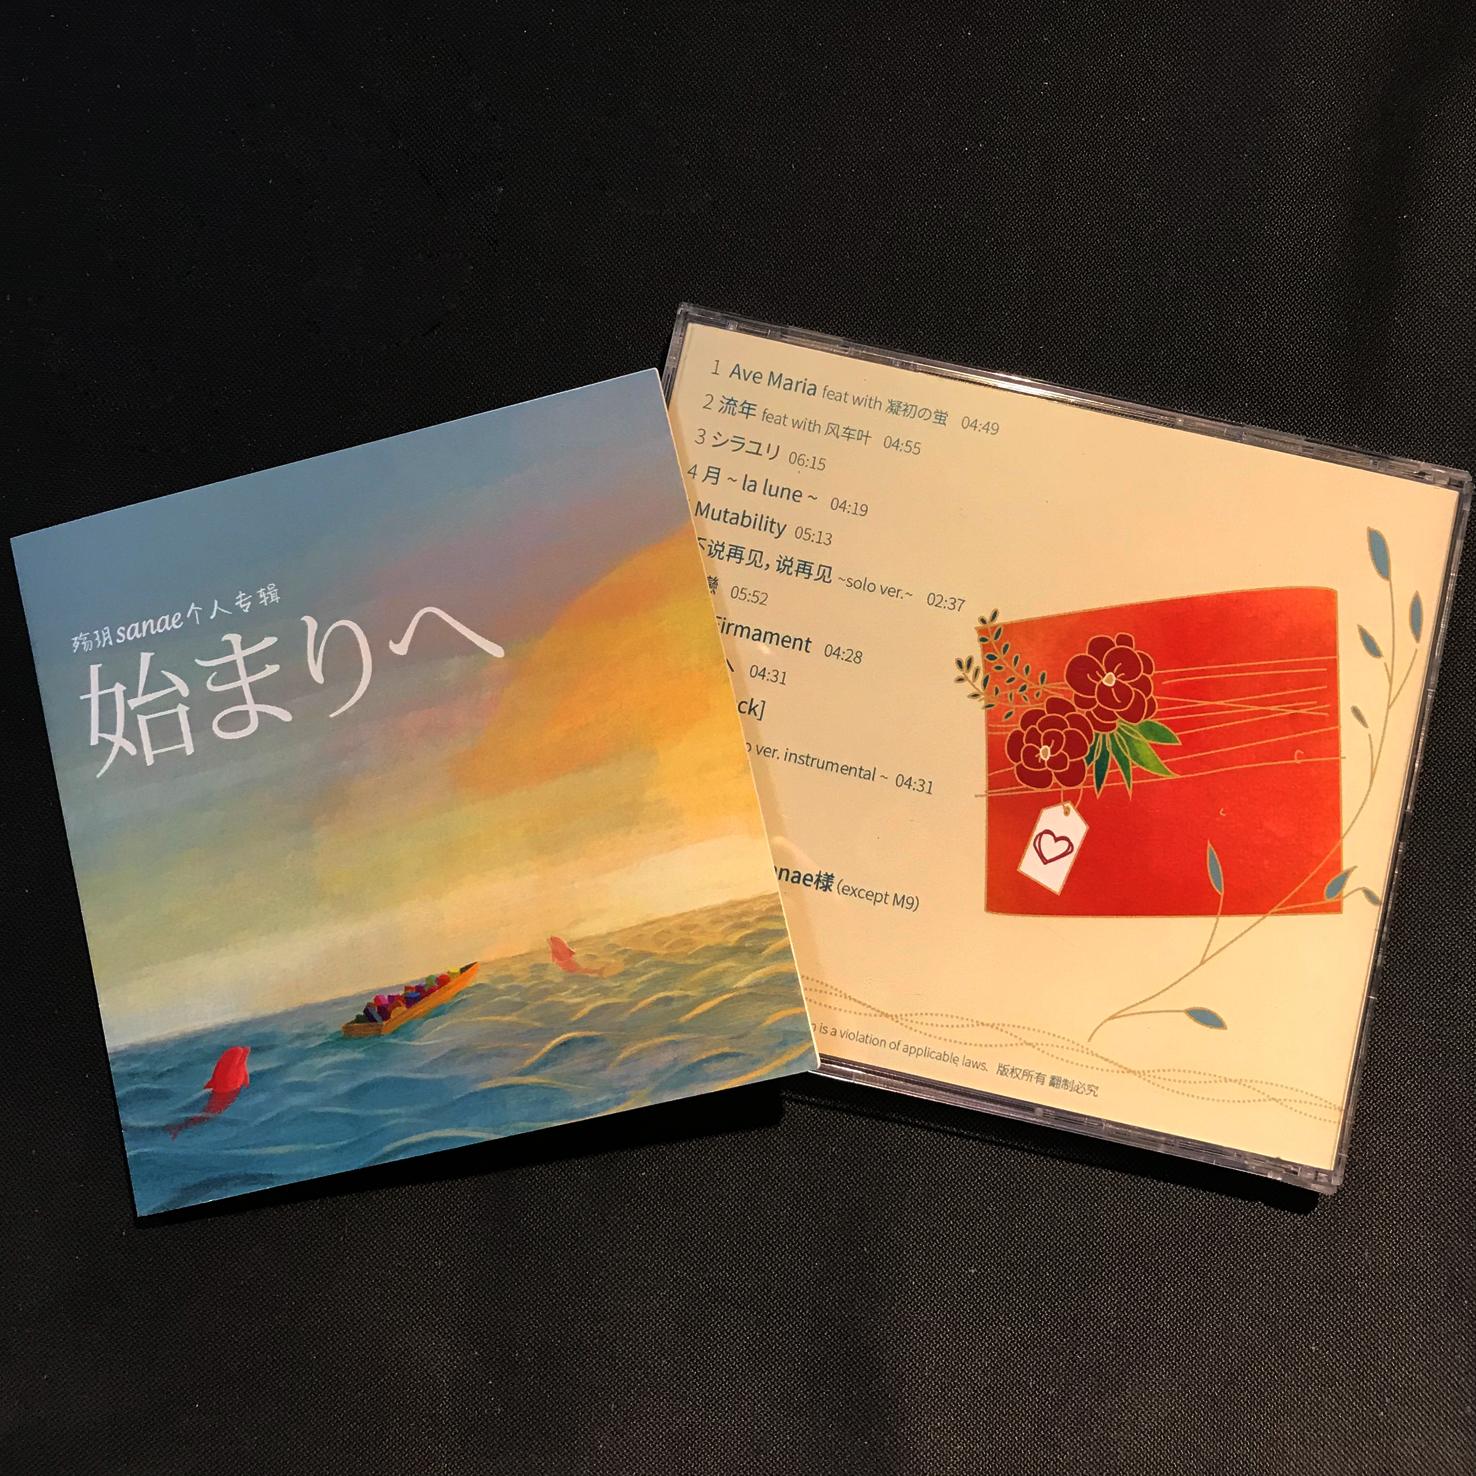 Personal music CD custom EP box CD making burning lyrics this creative DIY birthday gift